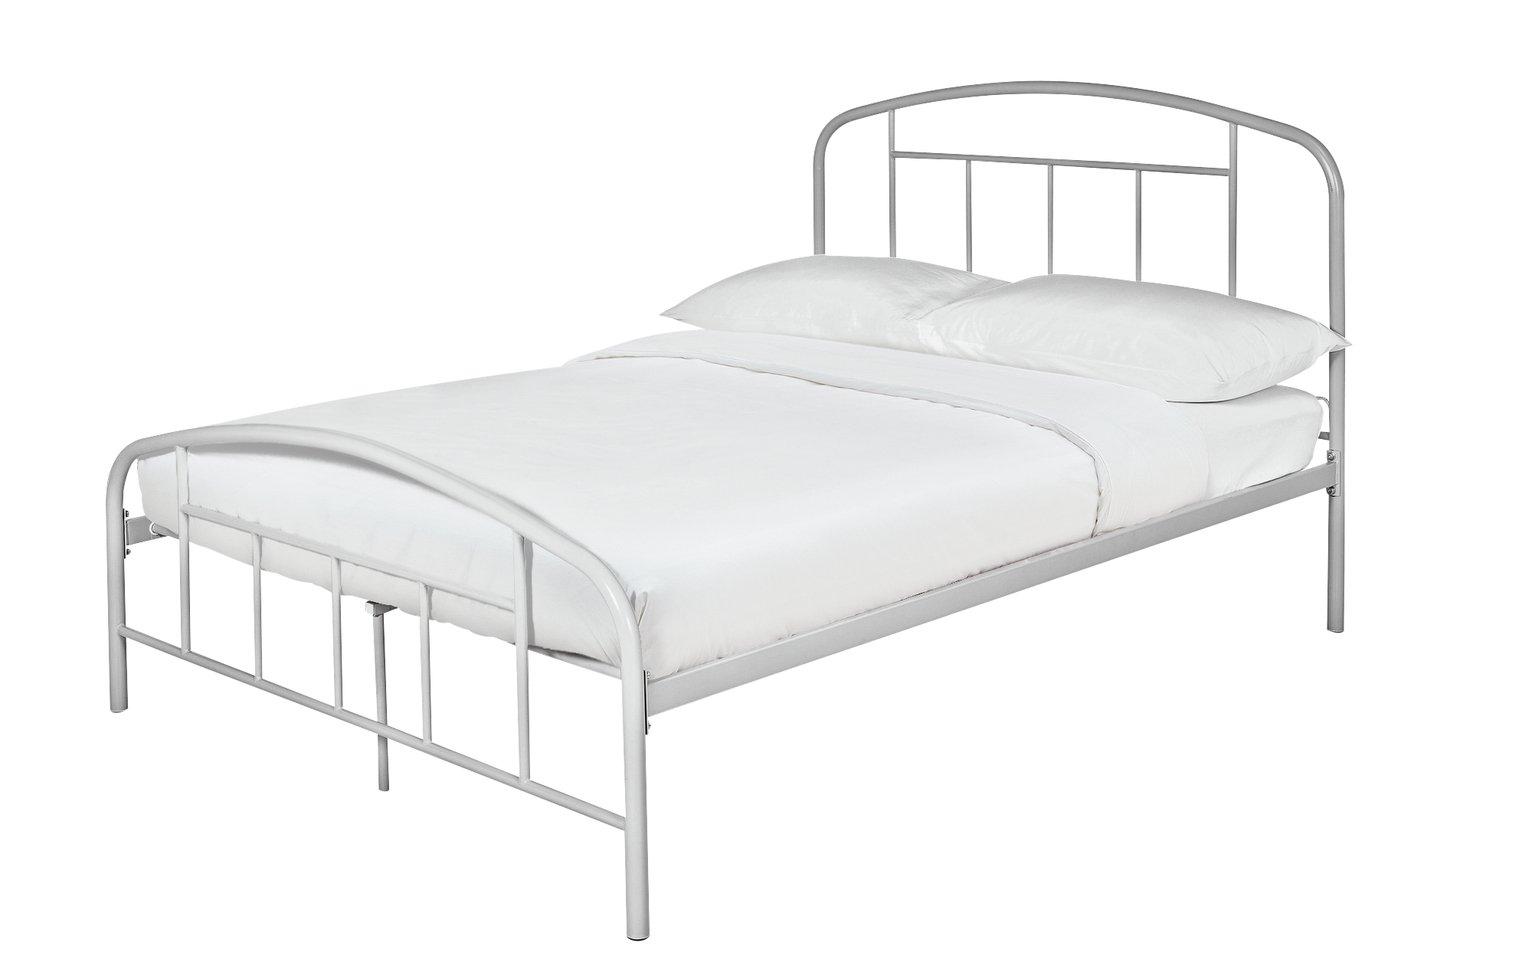 Argos Home Pippa Kingsize Bed Frame - Grey